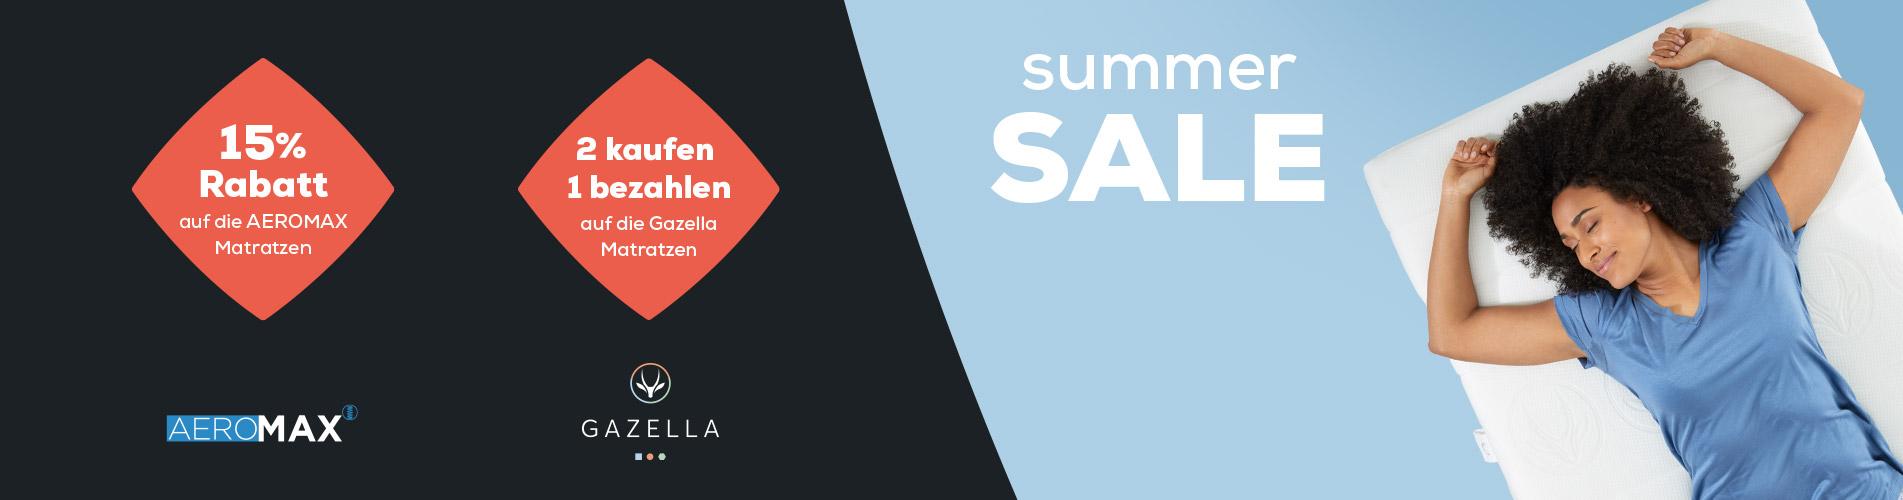 Matratzen kollektion - Summer Sale   Swiss Sense